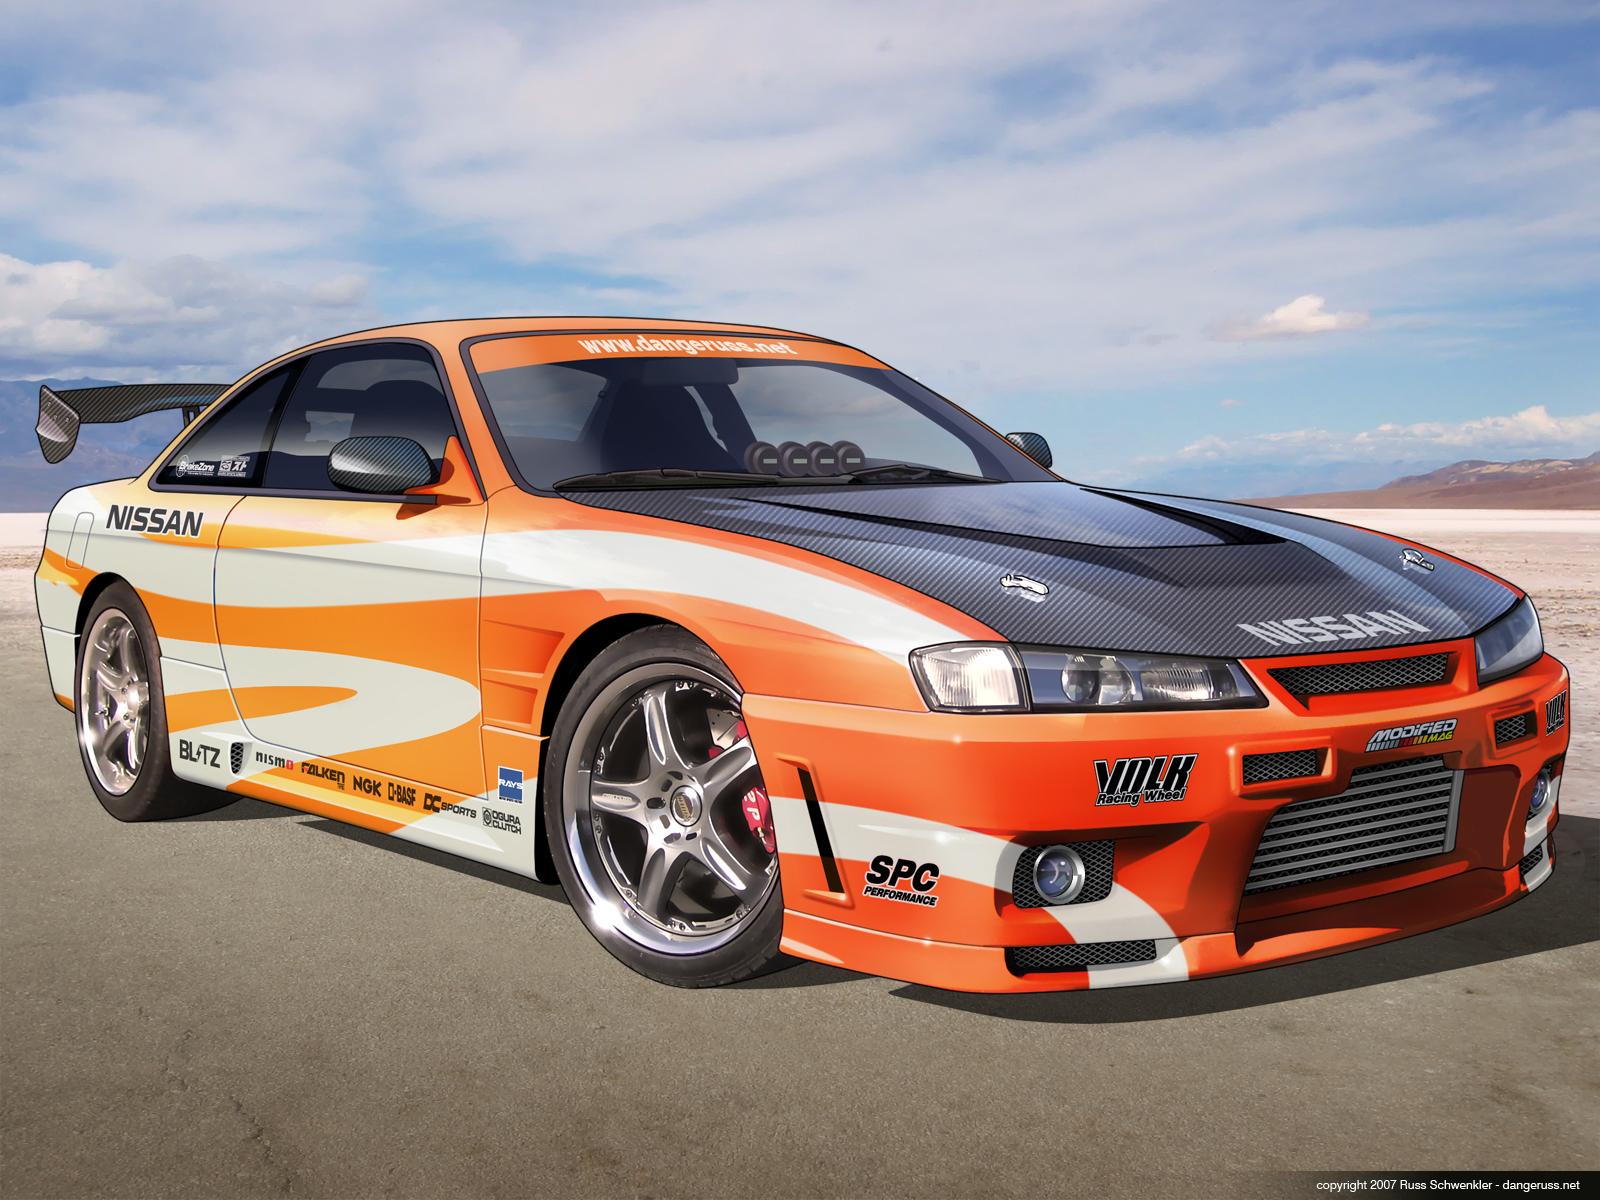 http://1.bp.blogspot.com/-t_YoAPNMEhg/TVj24M1QroI/AAAAAAAAARo/nf3RKg_fRjc/s1600/Nissan_S14_Silvia_custom_by_dangeruss.jpg